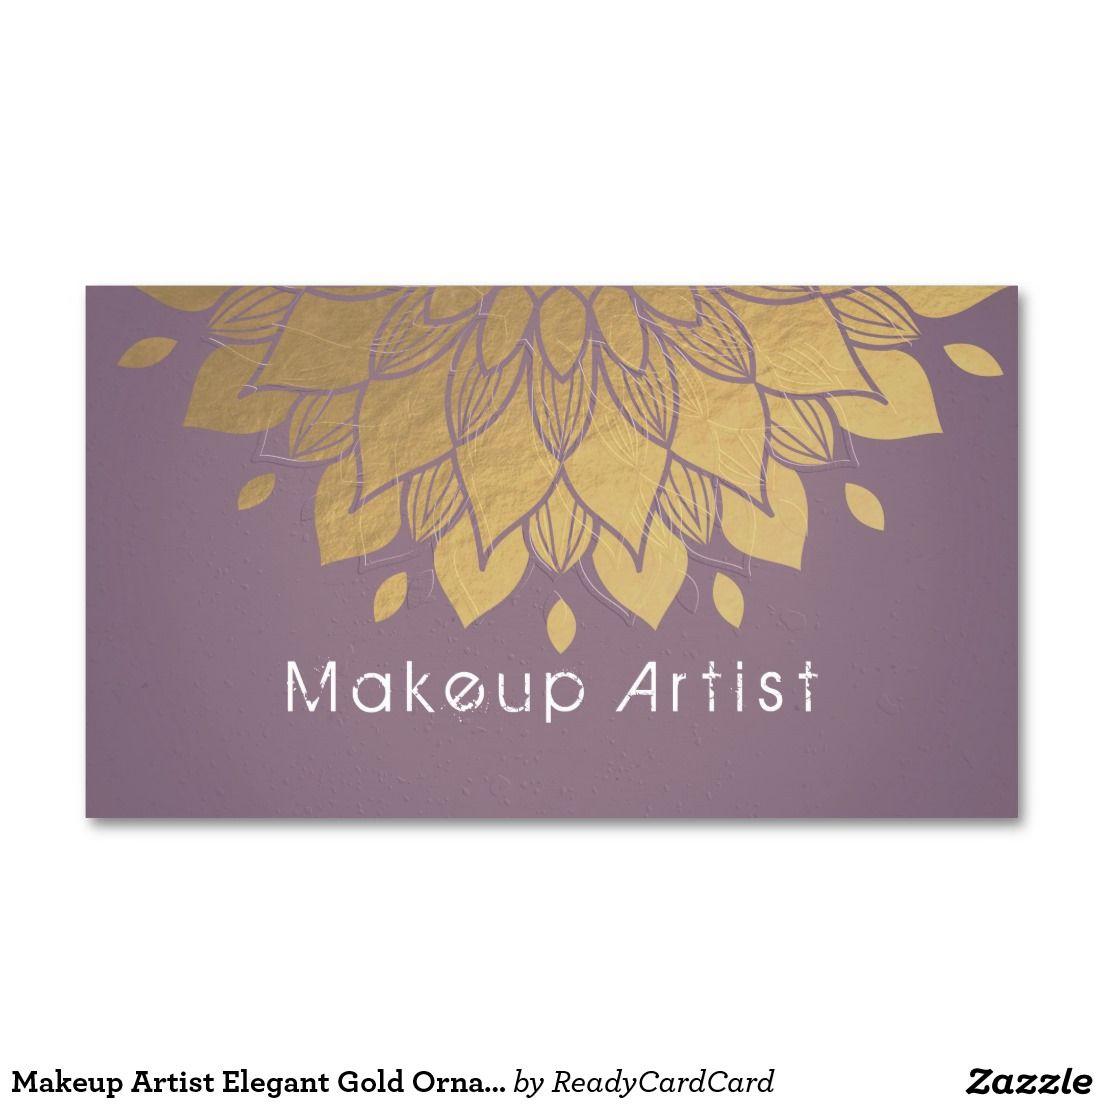 Makeup Artist Elegant Gold Ornate Flower Business Appointment Card ...